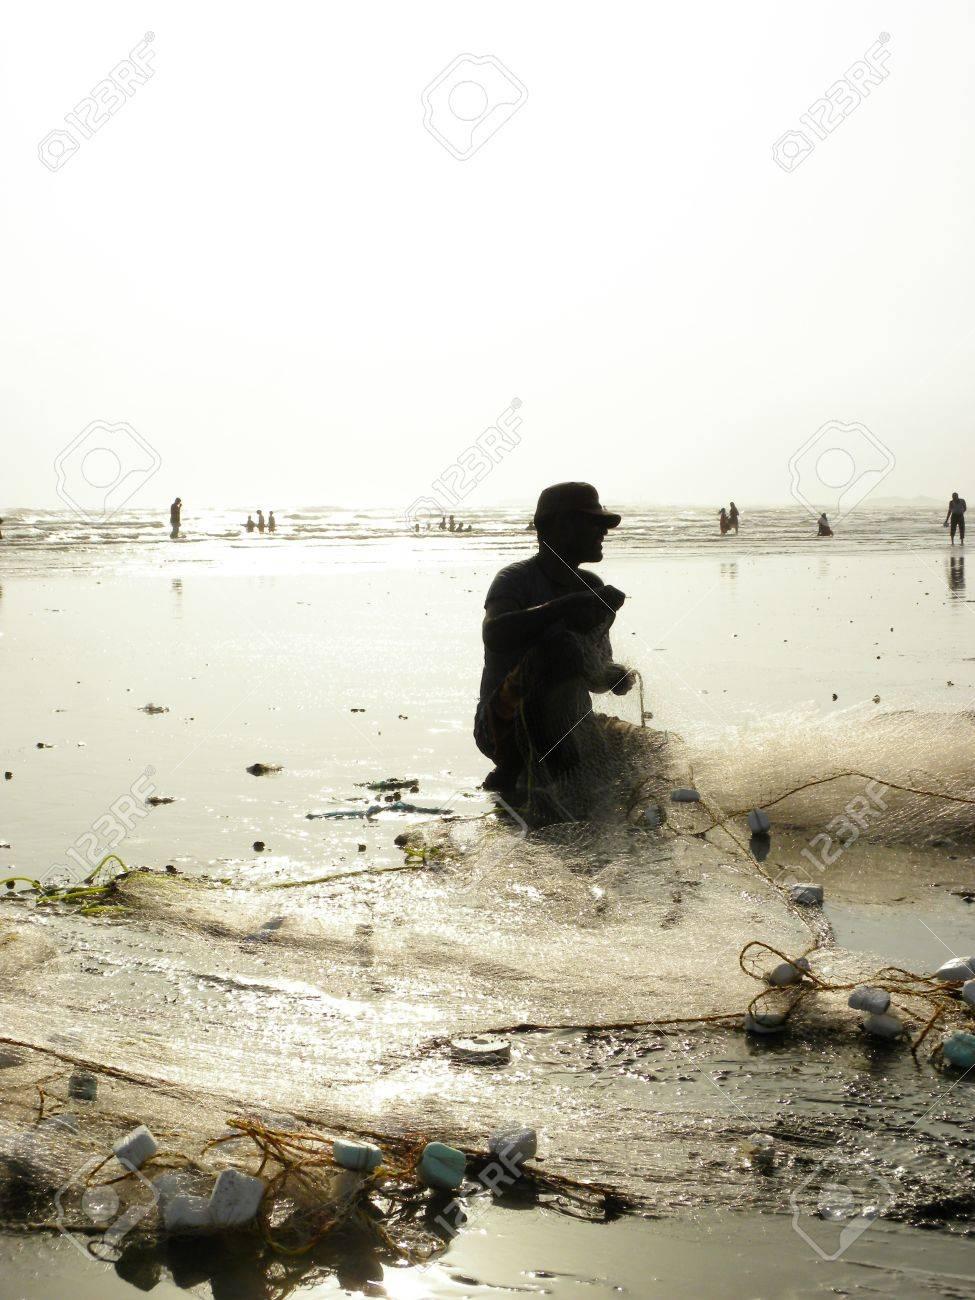 KARACHI PAKISTAN_FISHERMAN COLLECTING FISH FROM FISH NET AT SEA